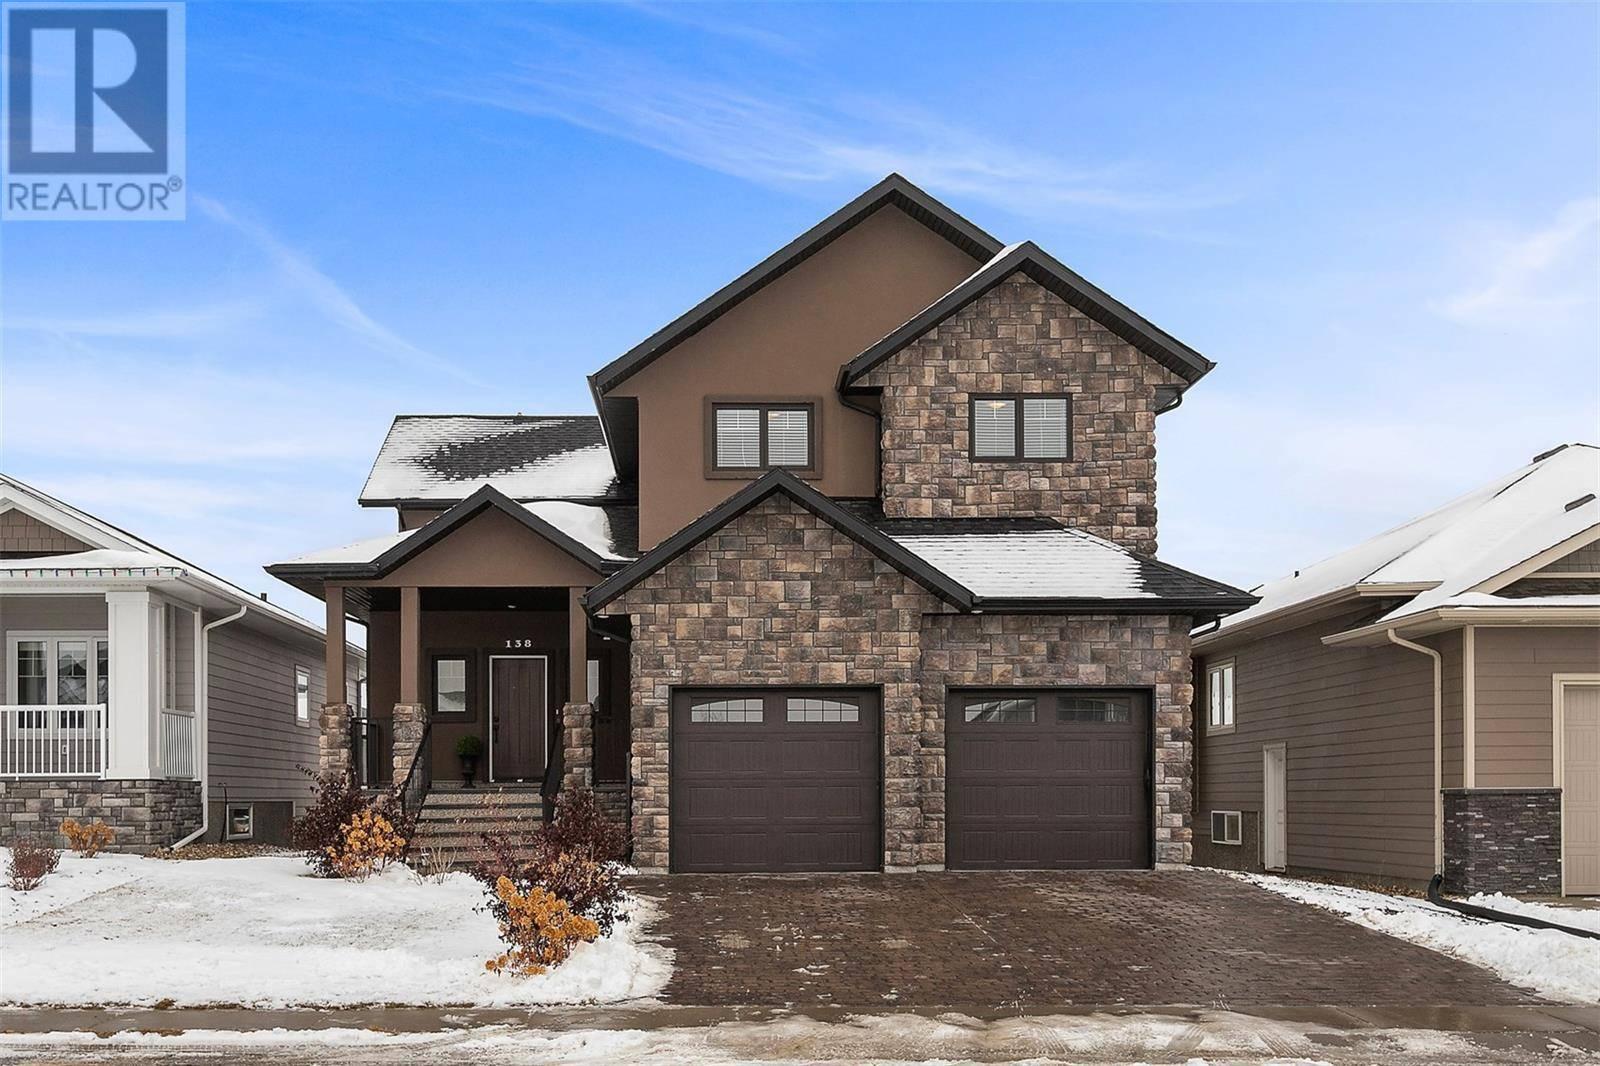 House for sale at 138 Sinclair Cres Saskatoon Saskatchewan - MLS: SK792650